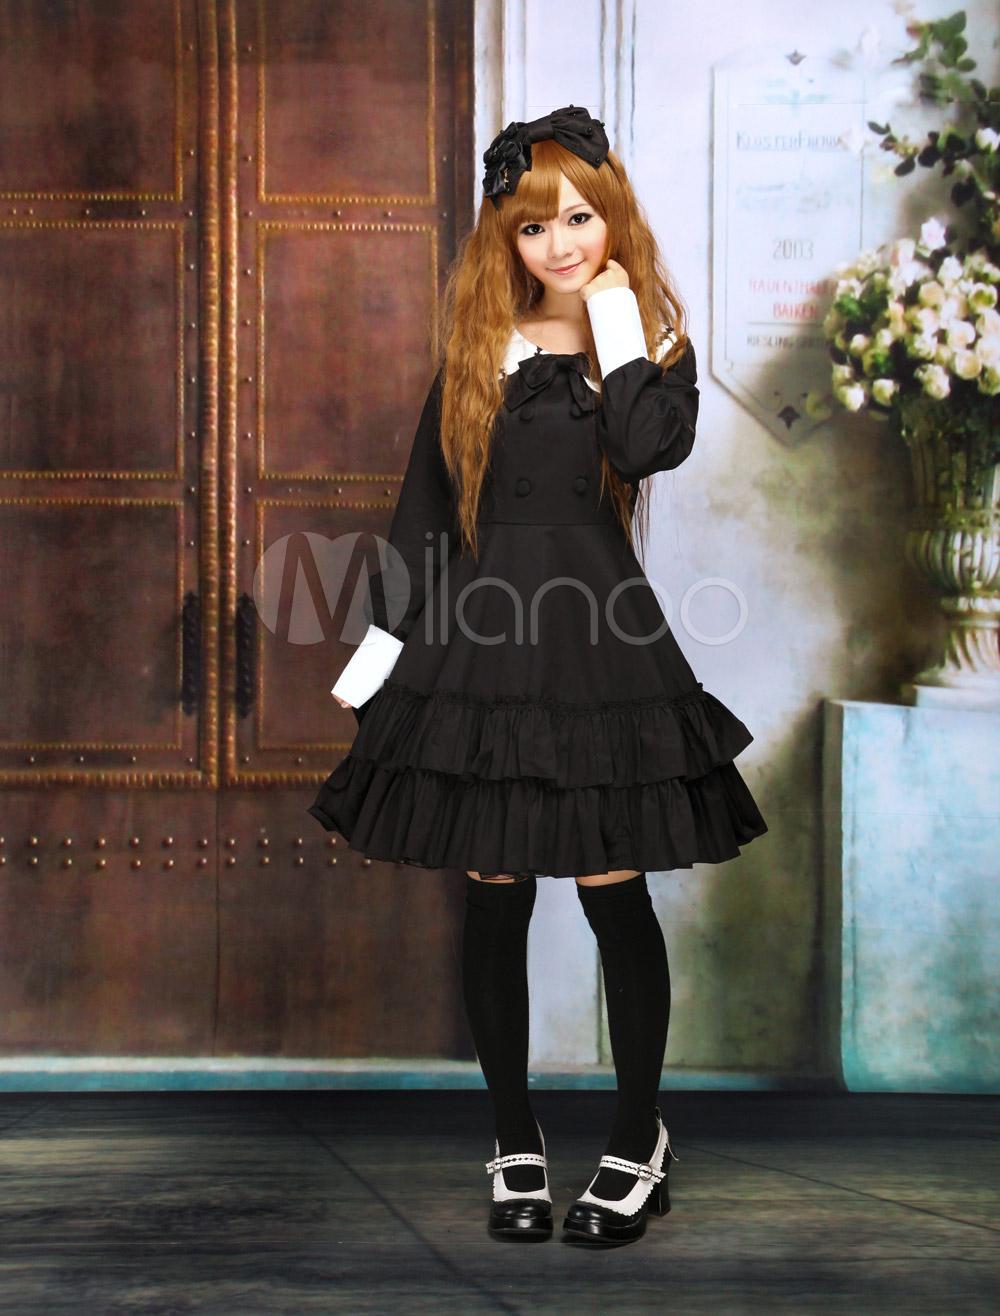 Buy Cotton Black Lolita OP Dress Long Sleeves College School Style Ruffles for $80.99 in Milanoo store